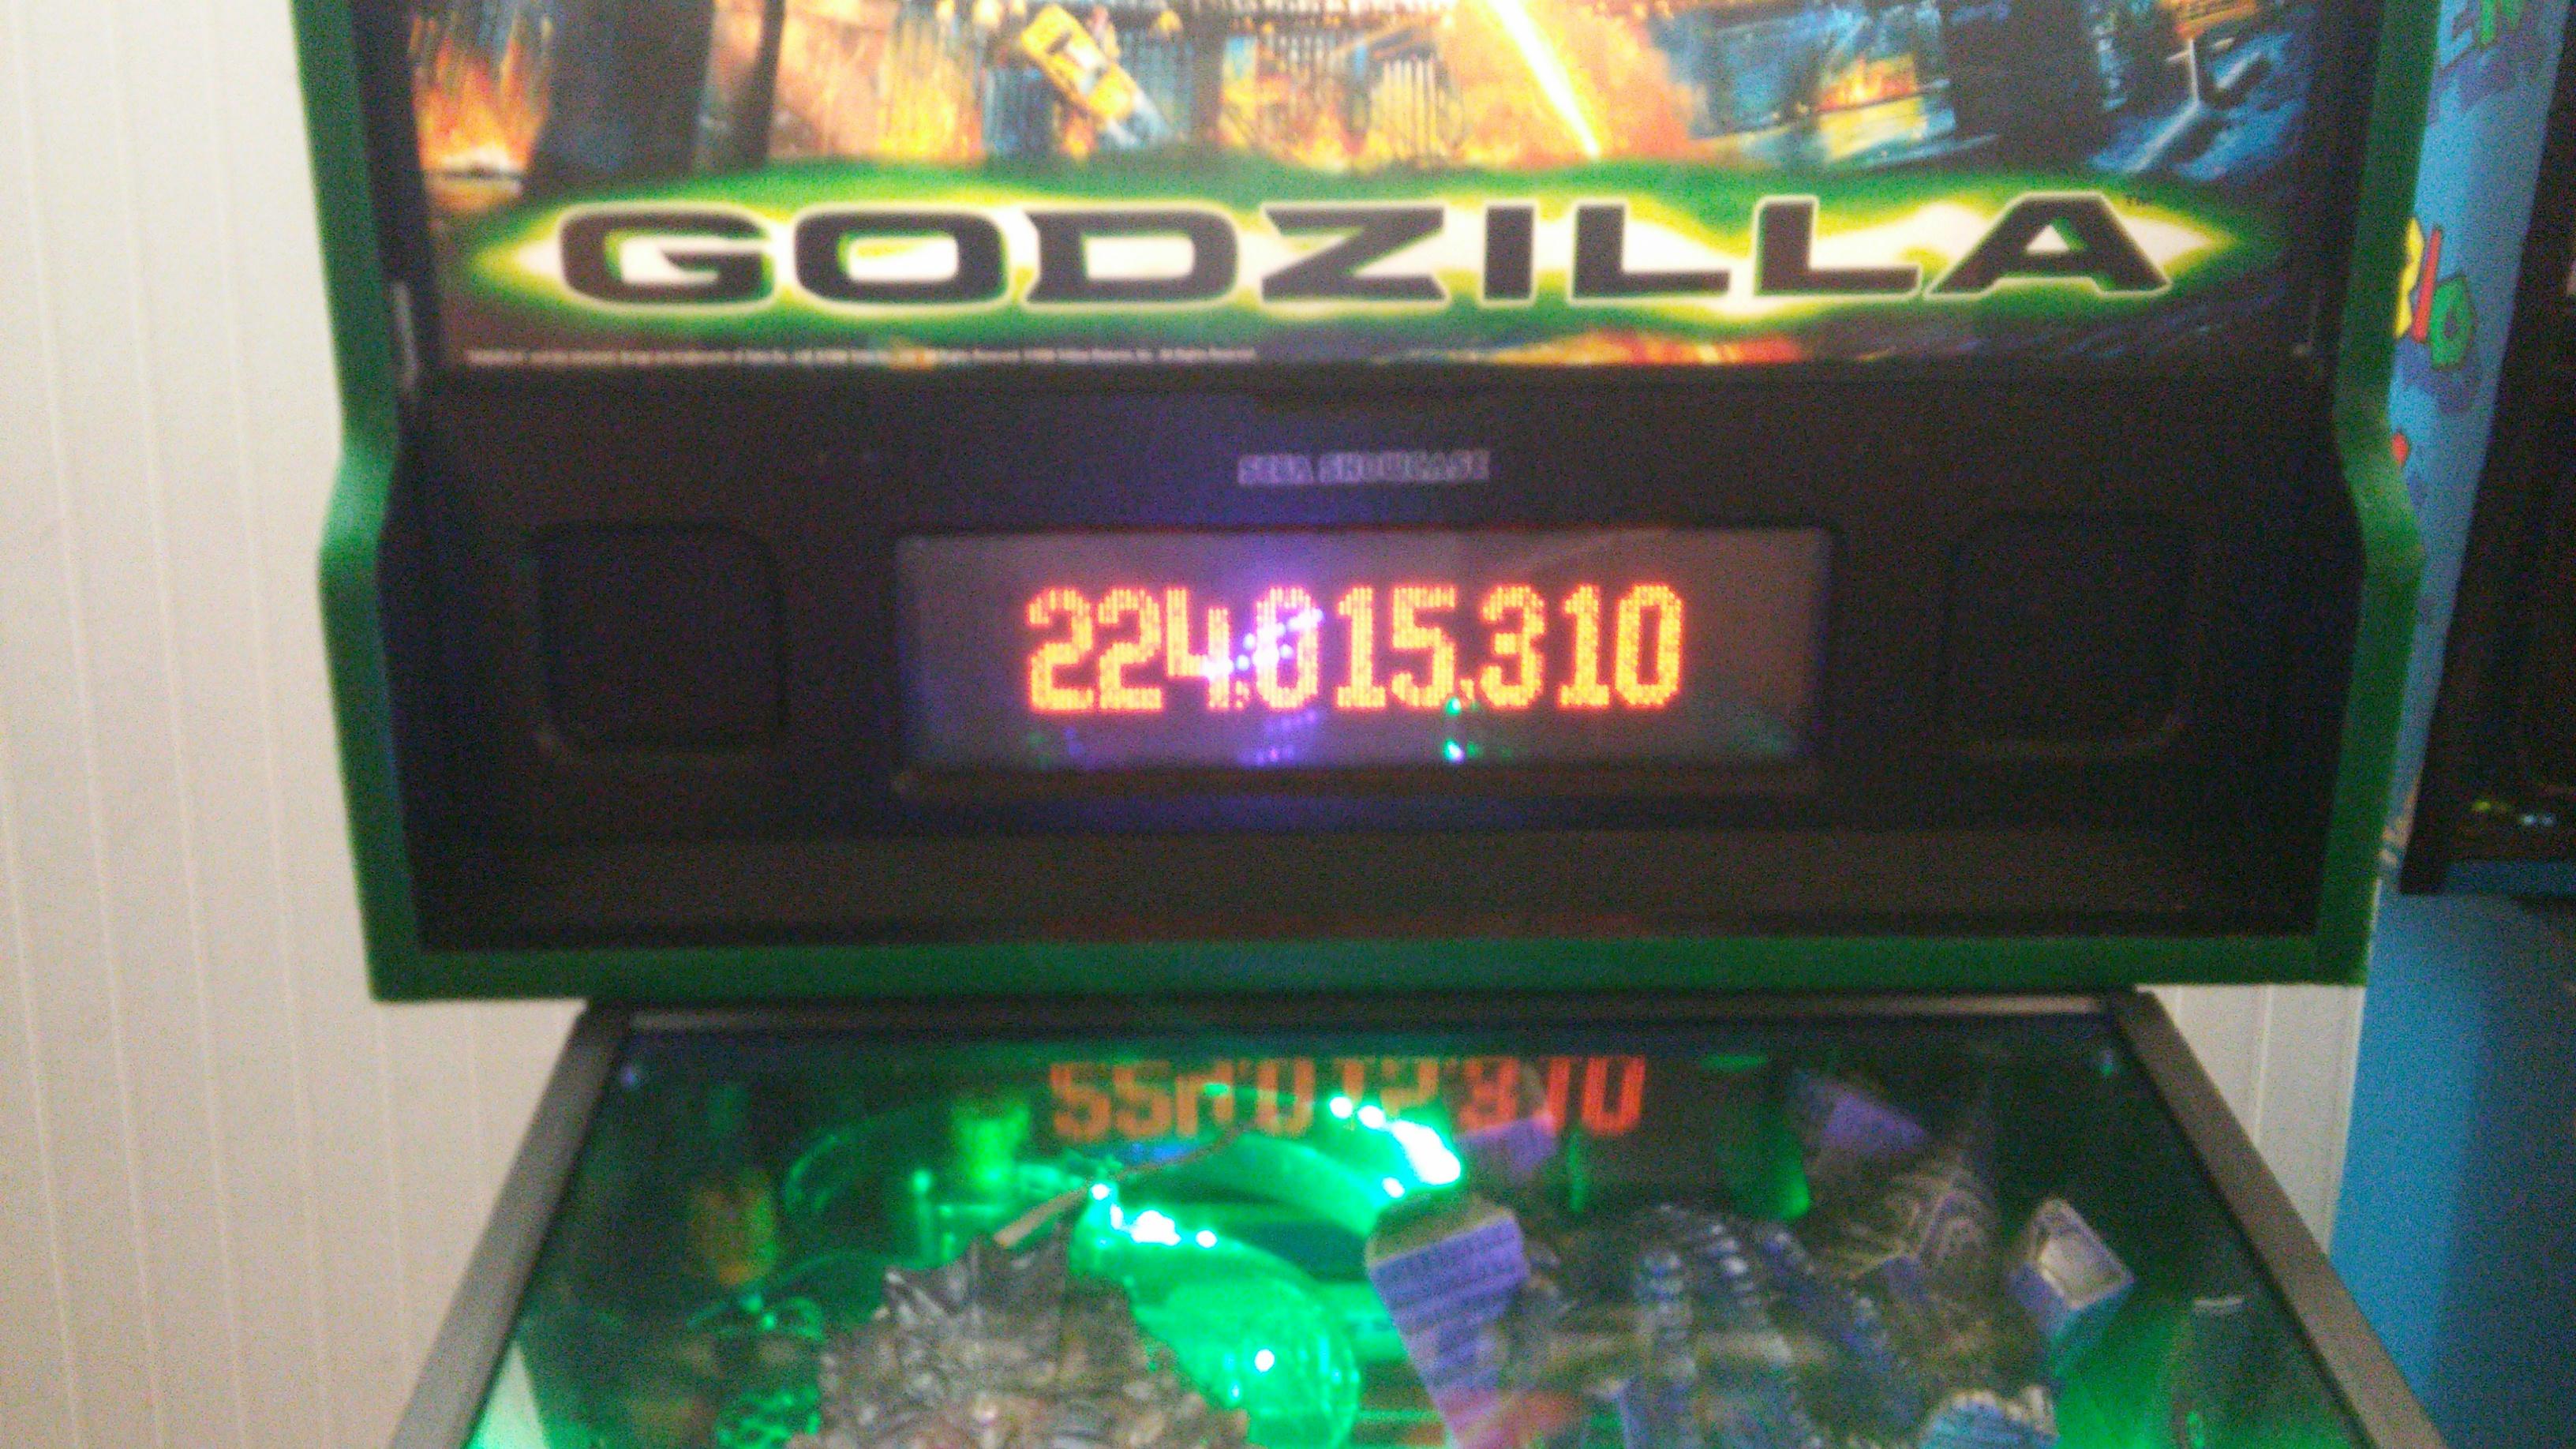 Godzilla 224,015,310 points